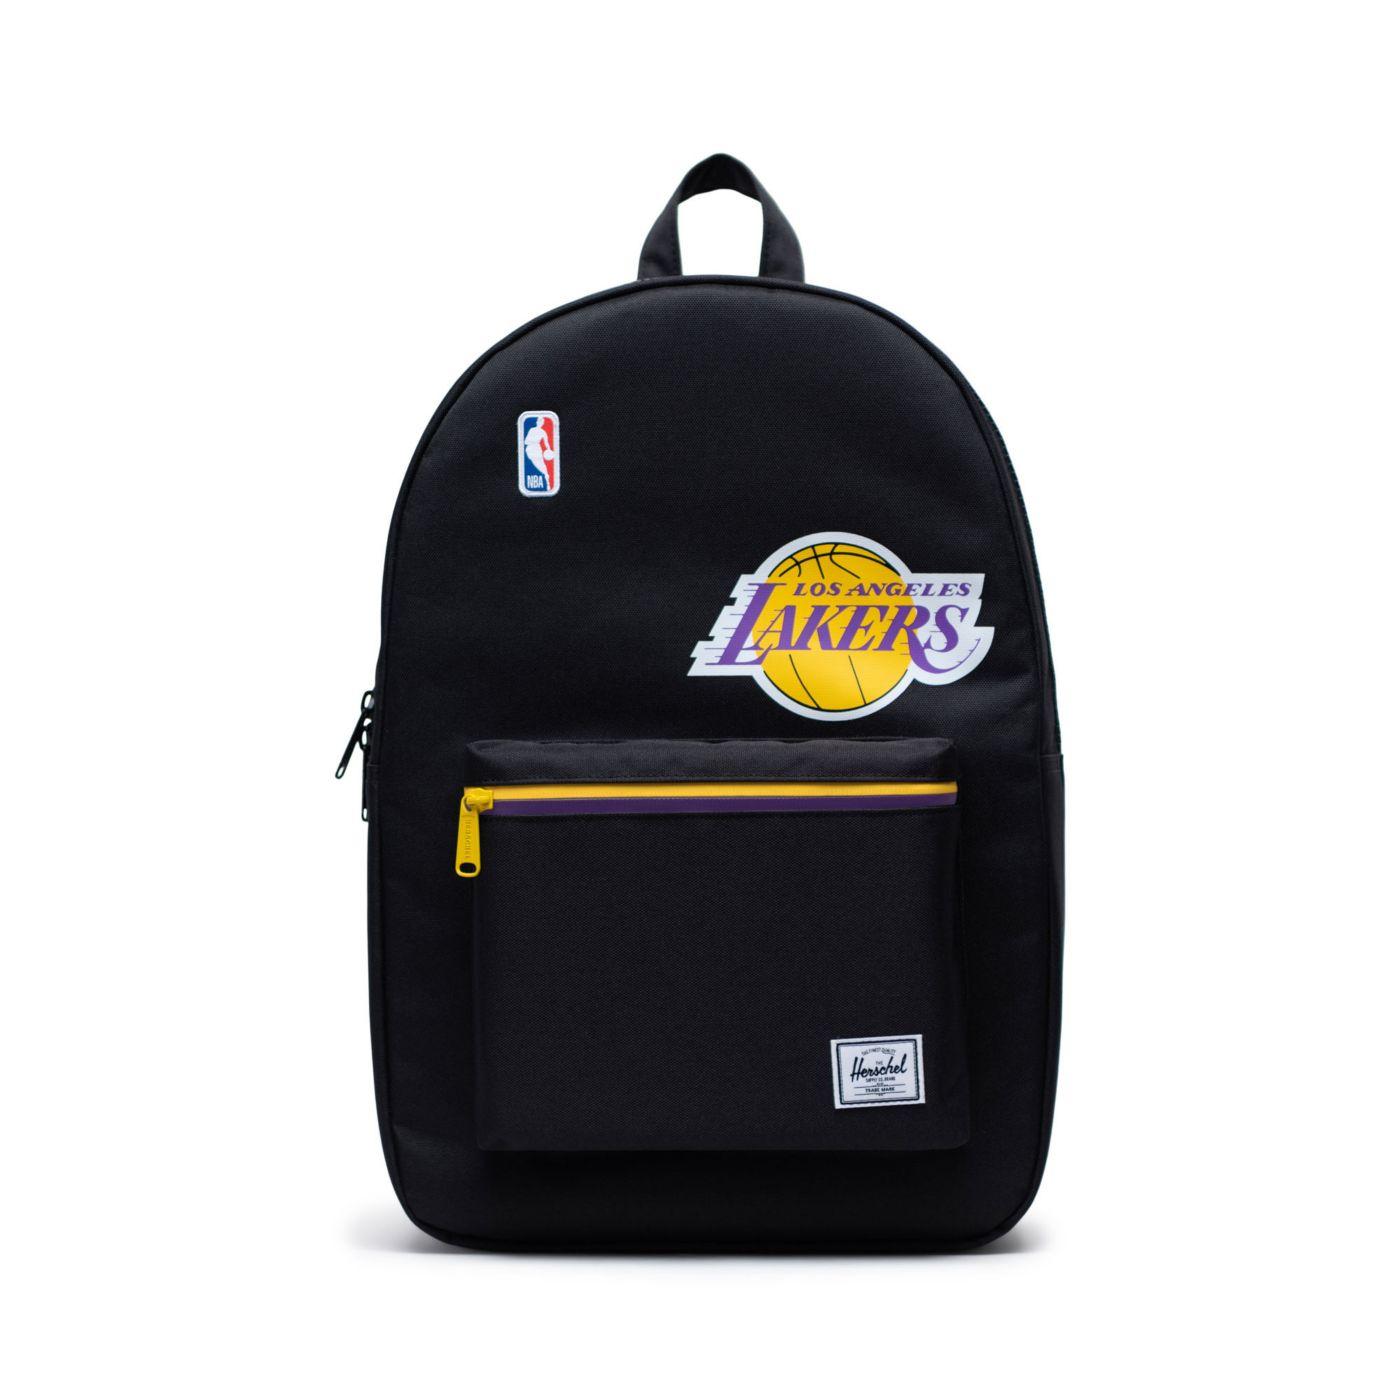 Herschel Los Angeles Lakers Black Settlement Backpack